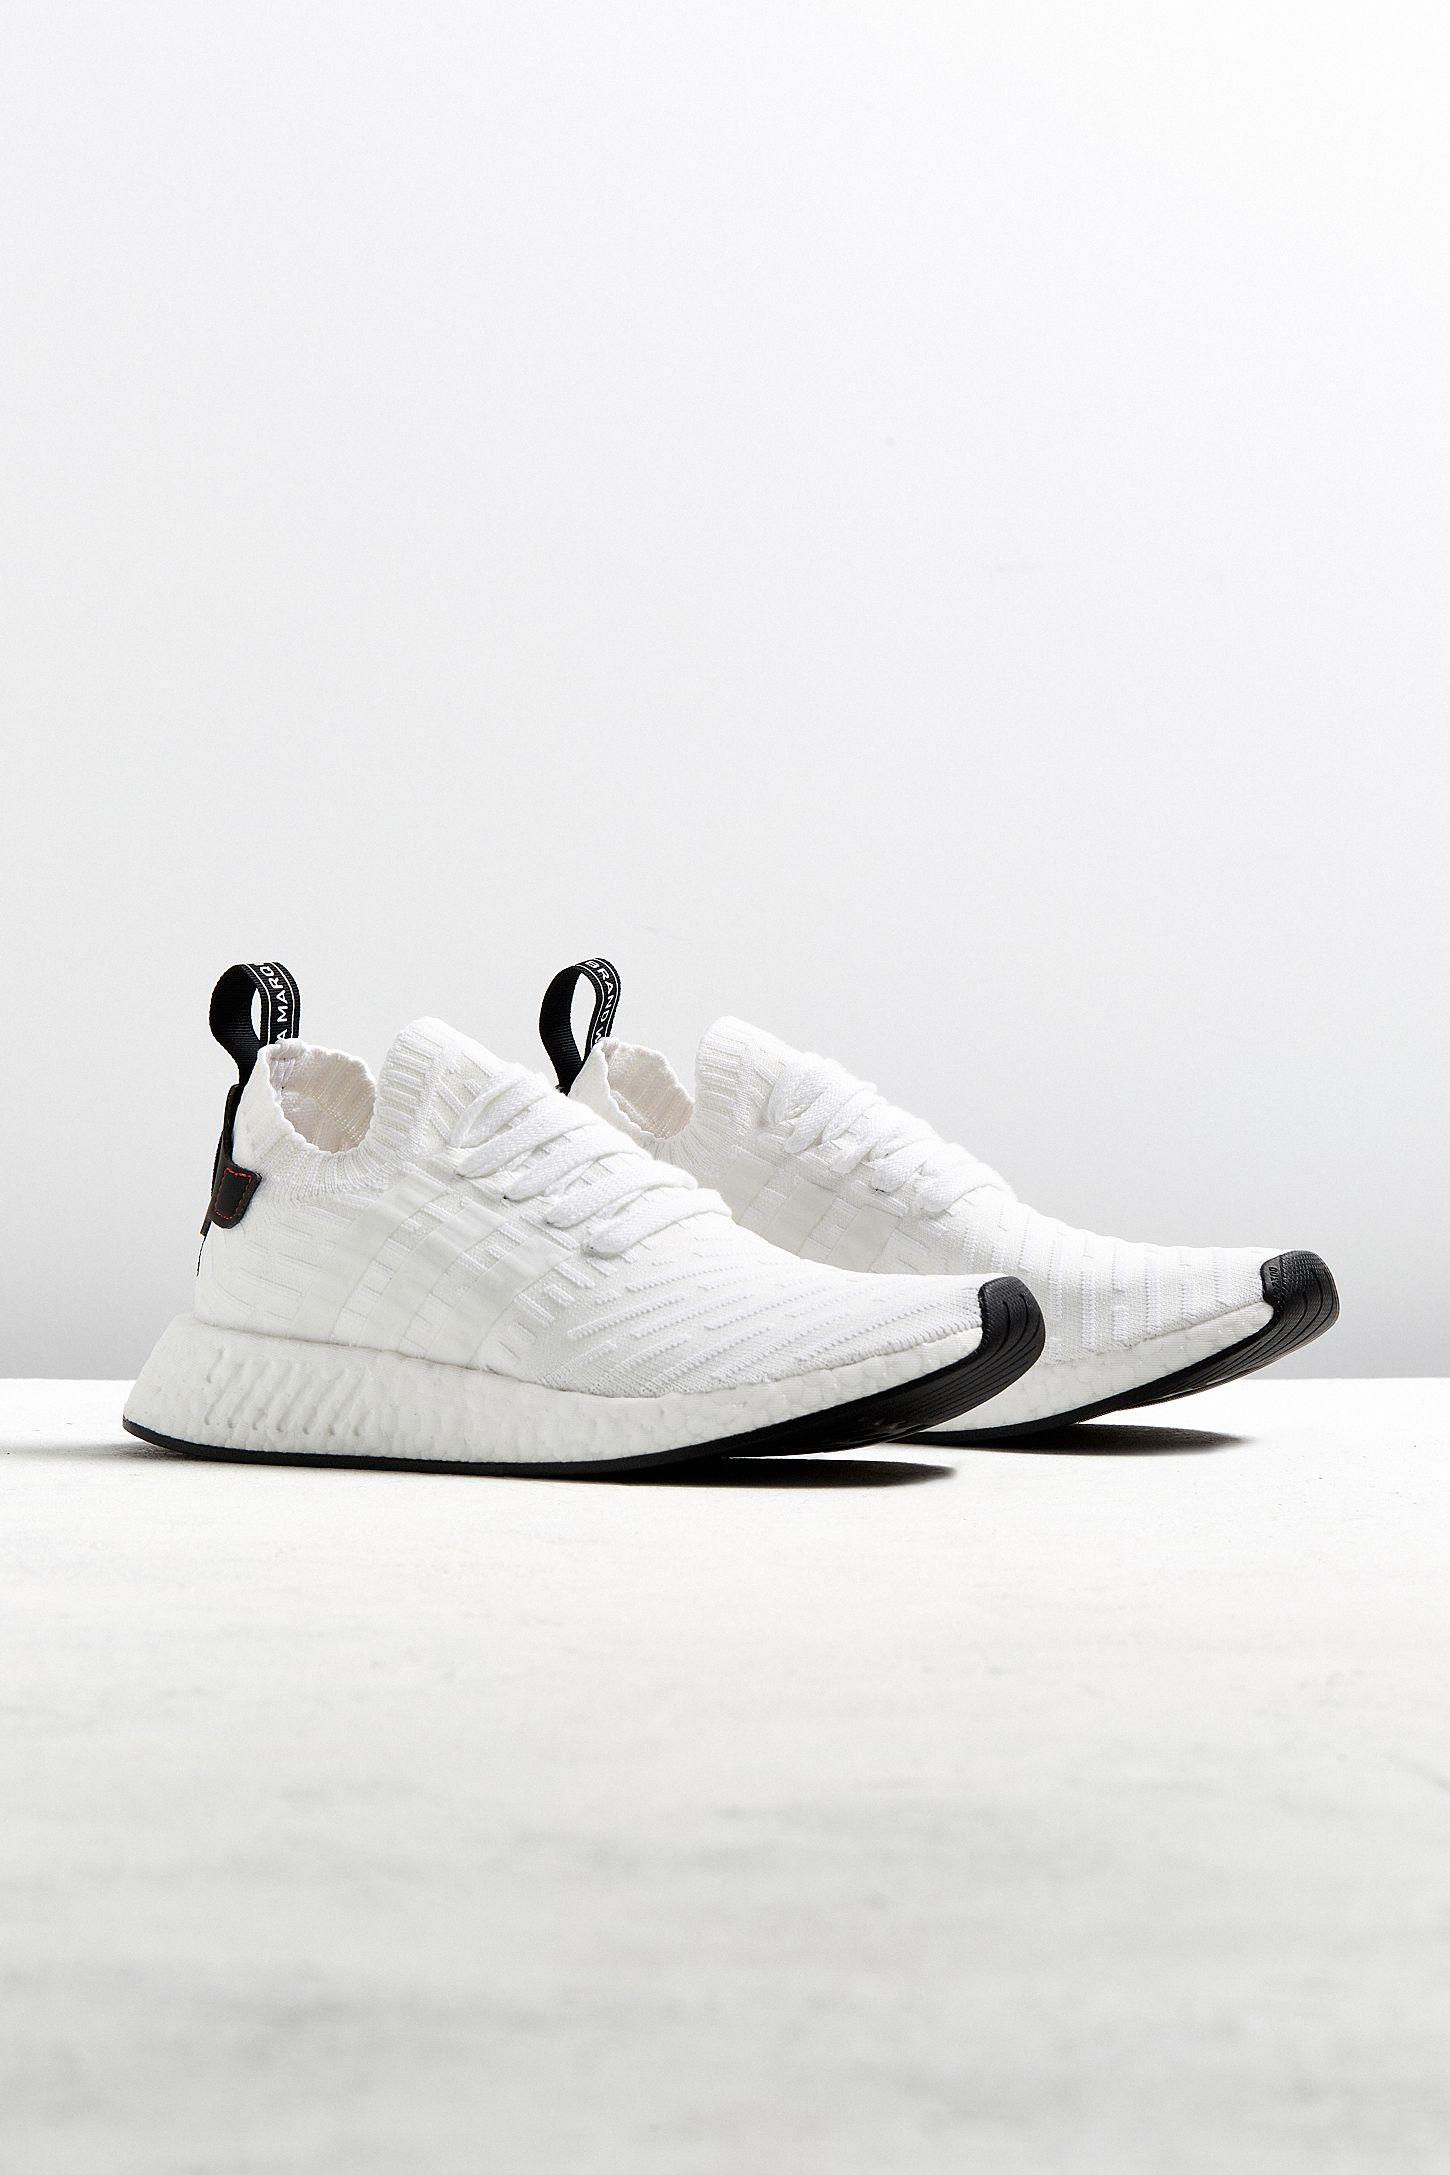 84203462c2ed8 adidas NMD R2 Core Black Primeknit Sneaker